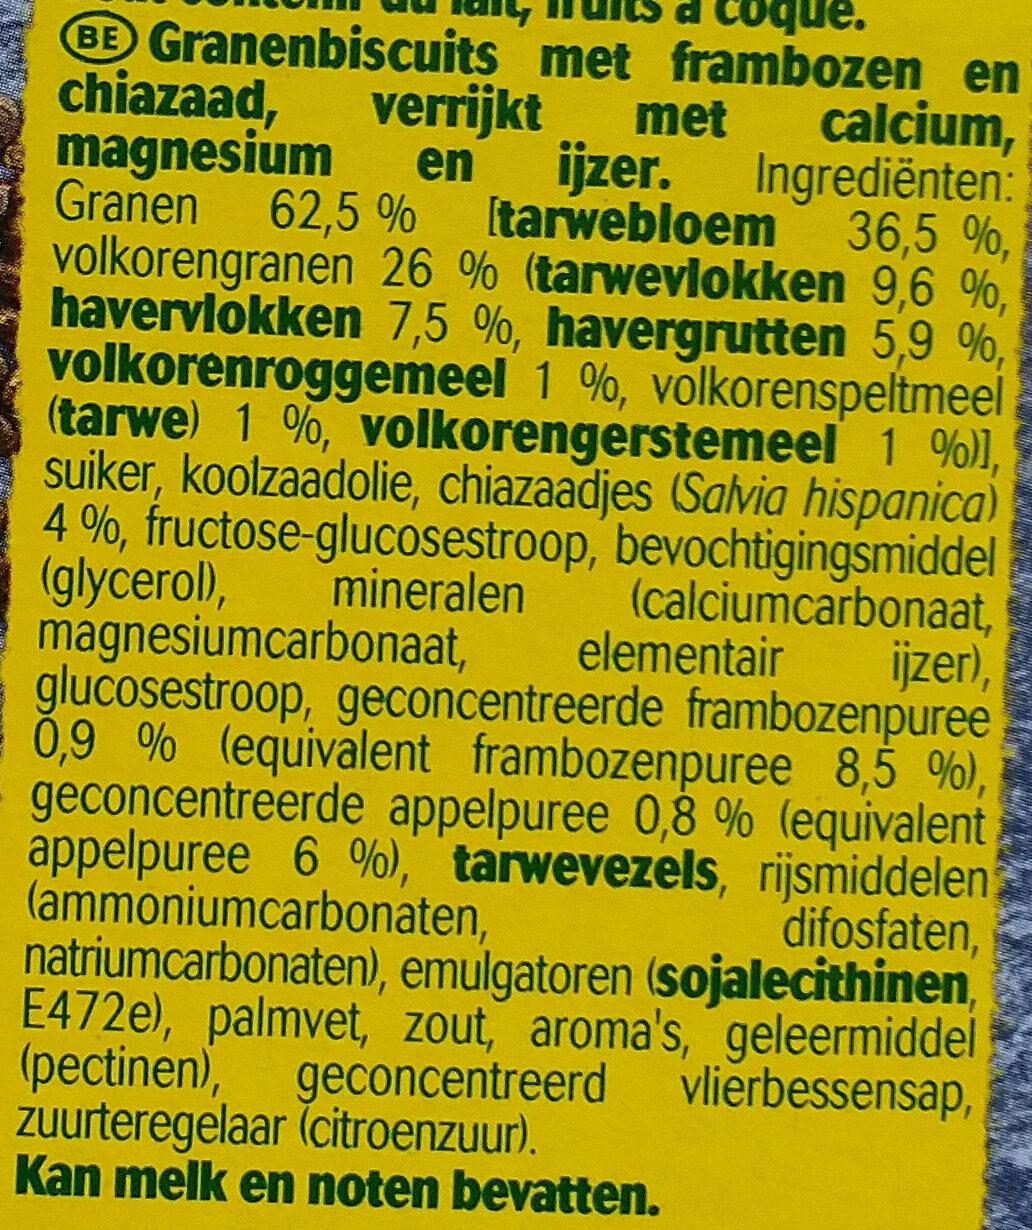 Graines et fruits - Framboises et graines de chia - Ingrediënten - nl